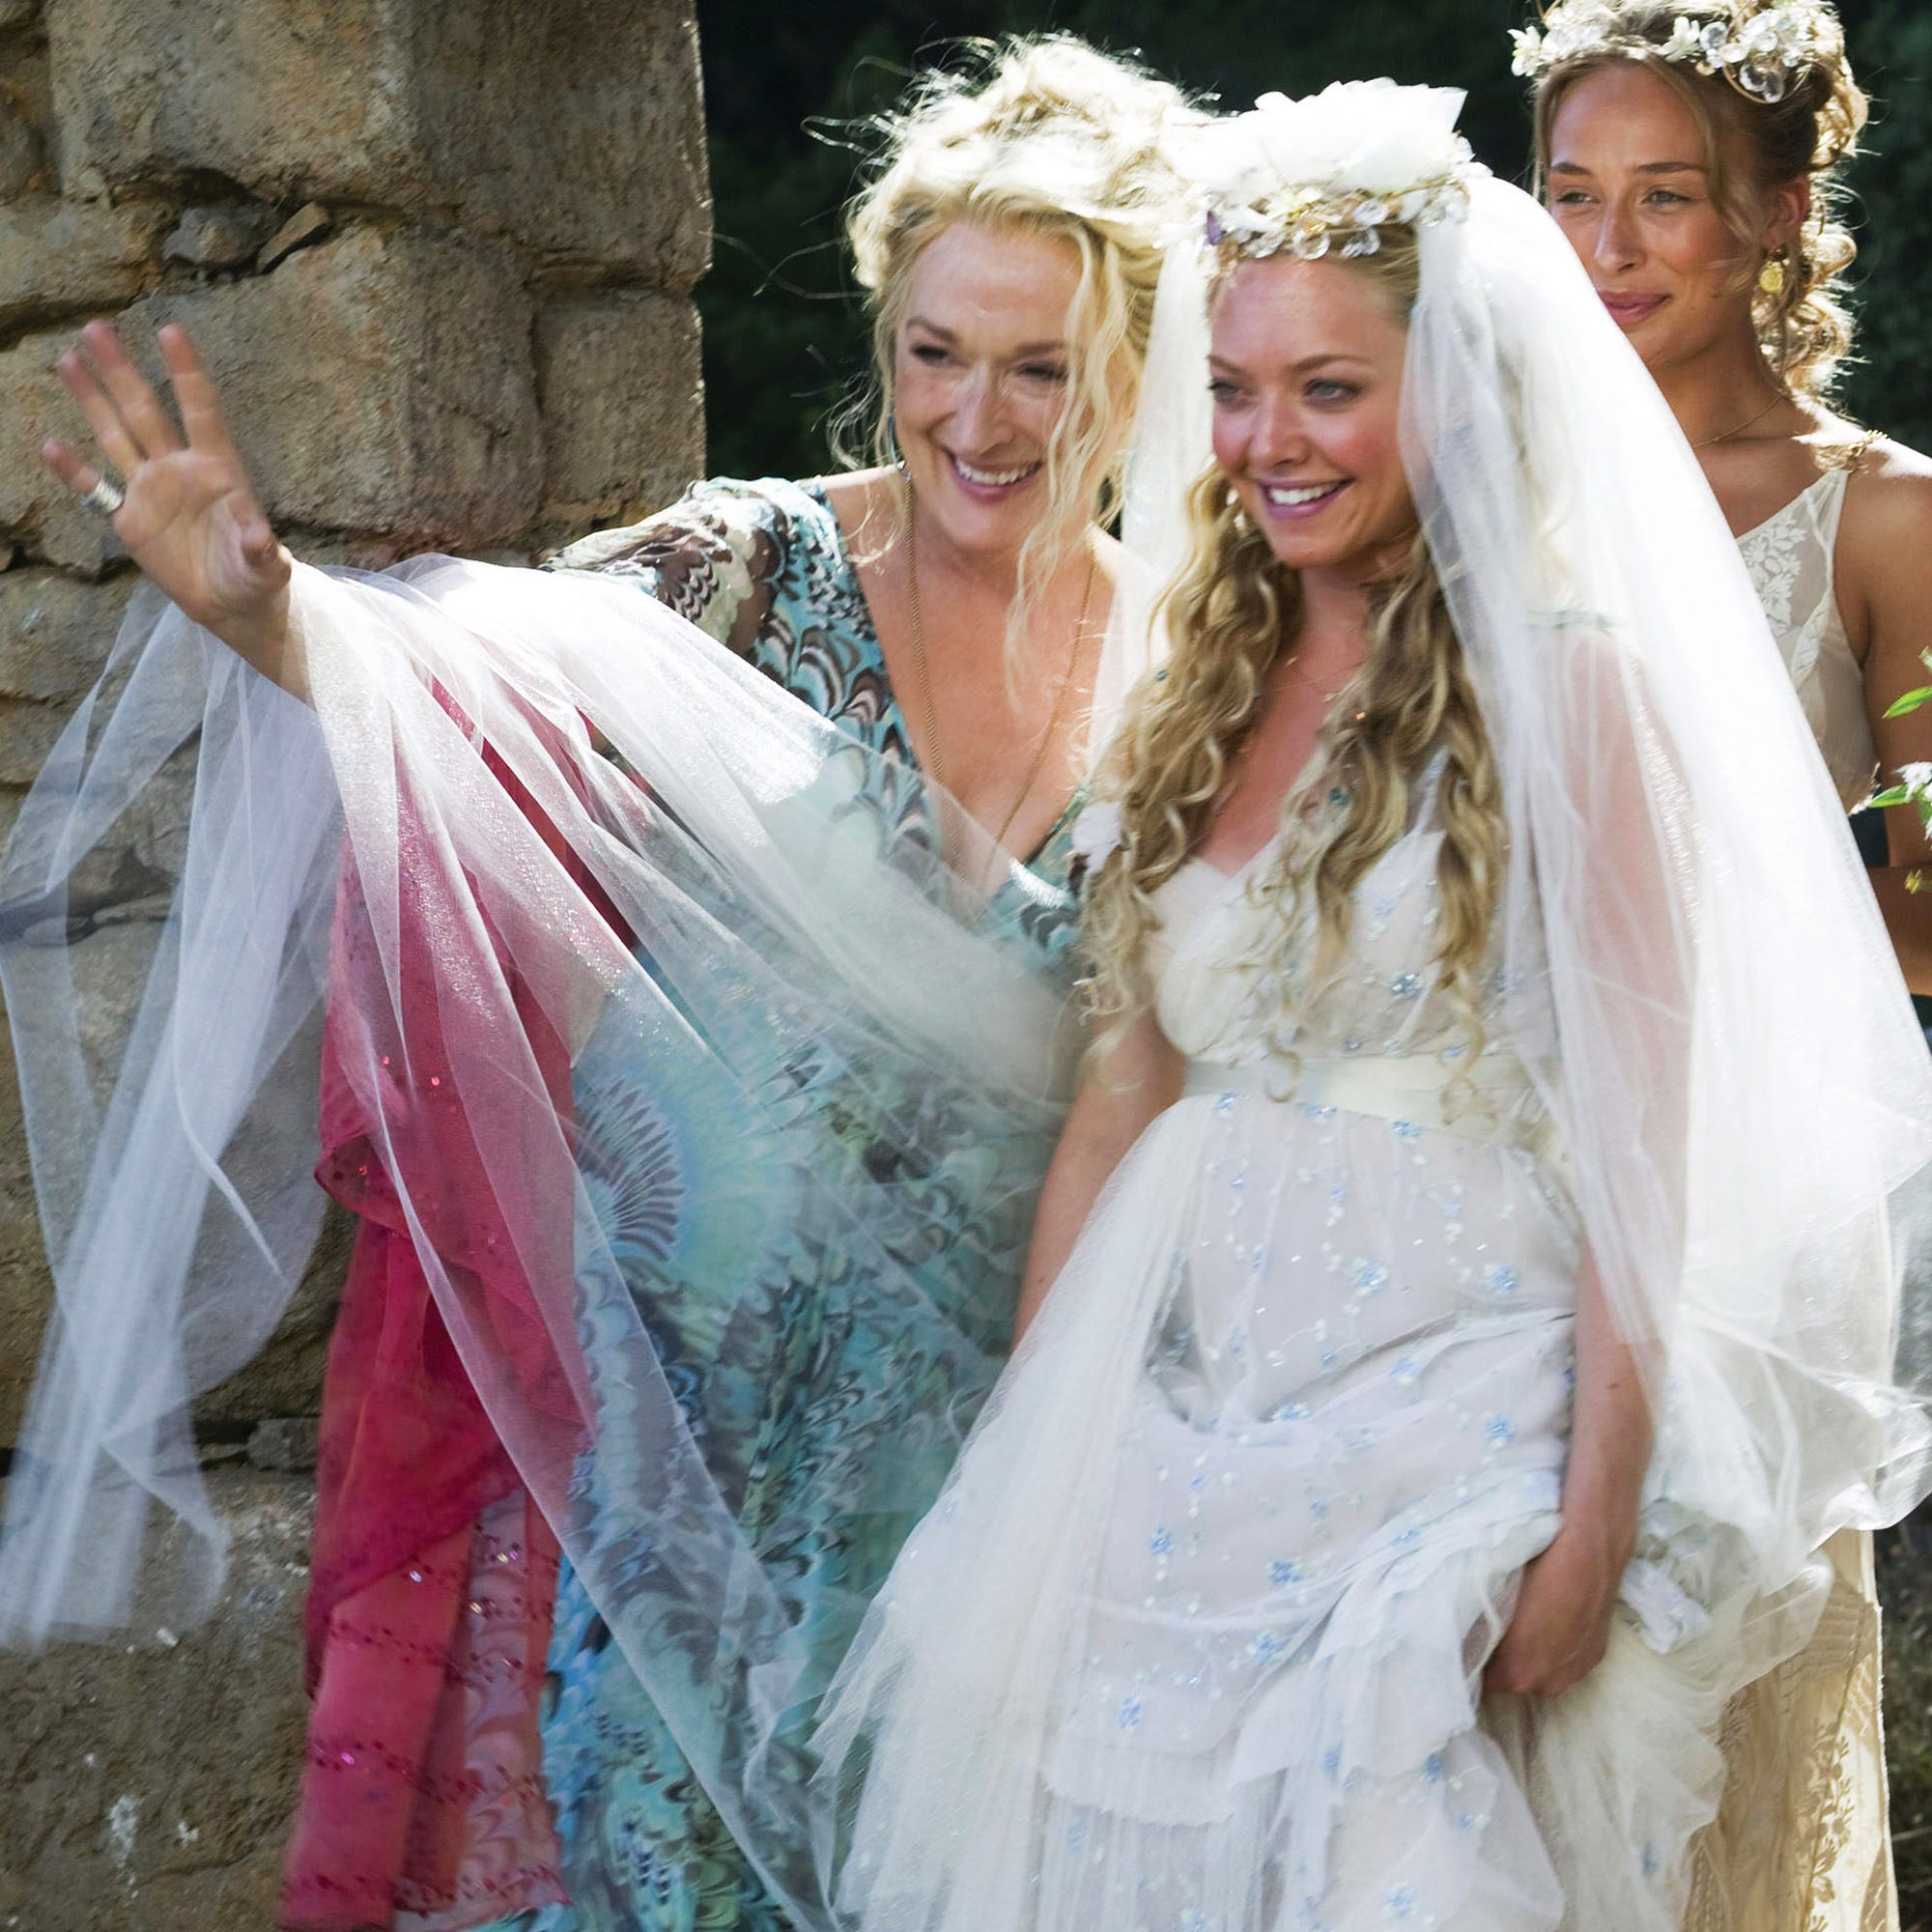 Amanda Seyfried Instagram Mamma Mia 2 Instgrams BHTS